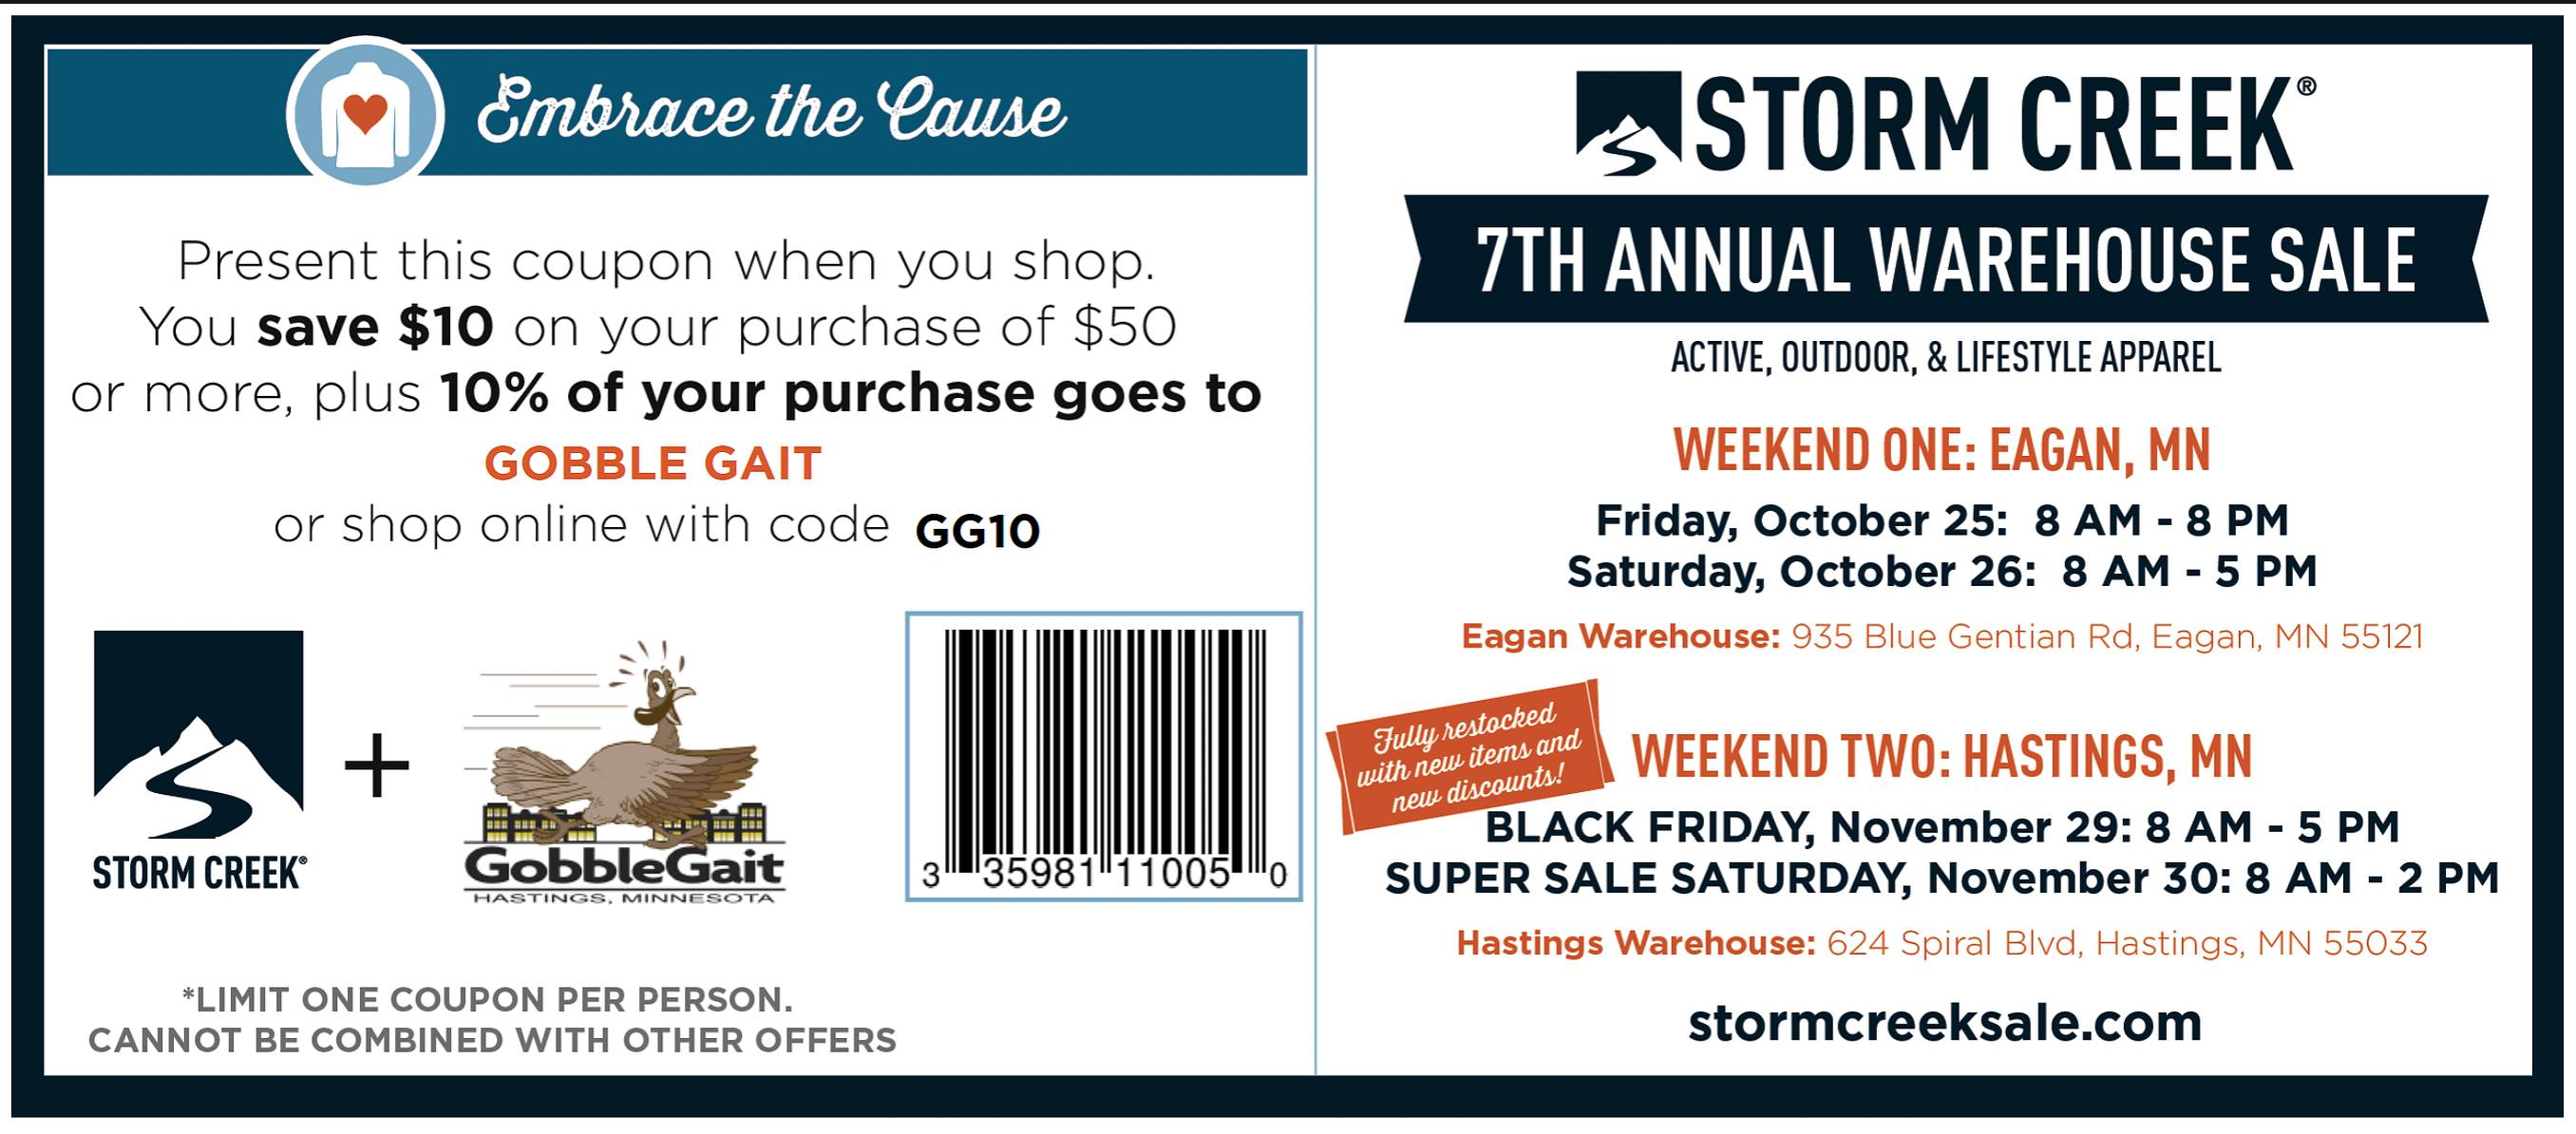 Storm Creek Warehouse Sale